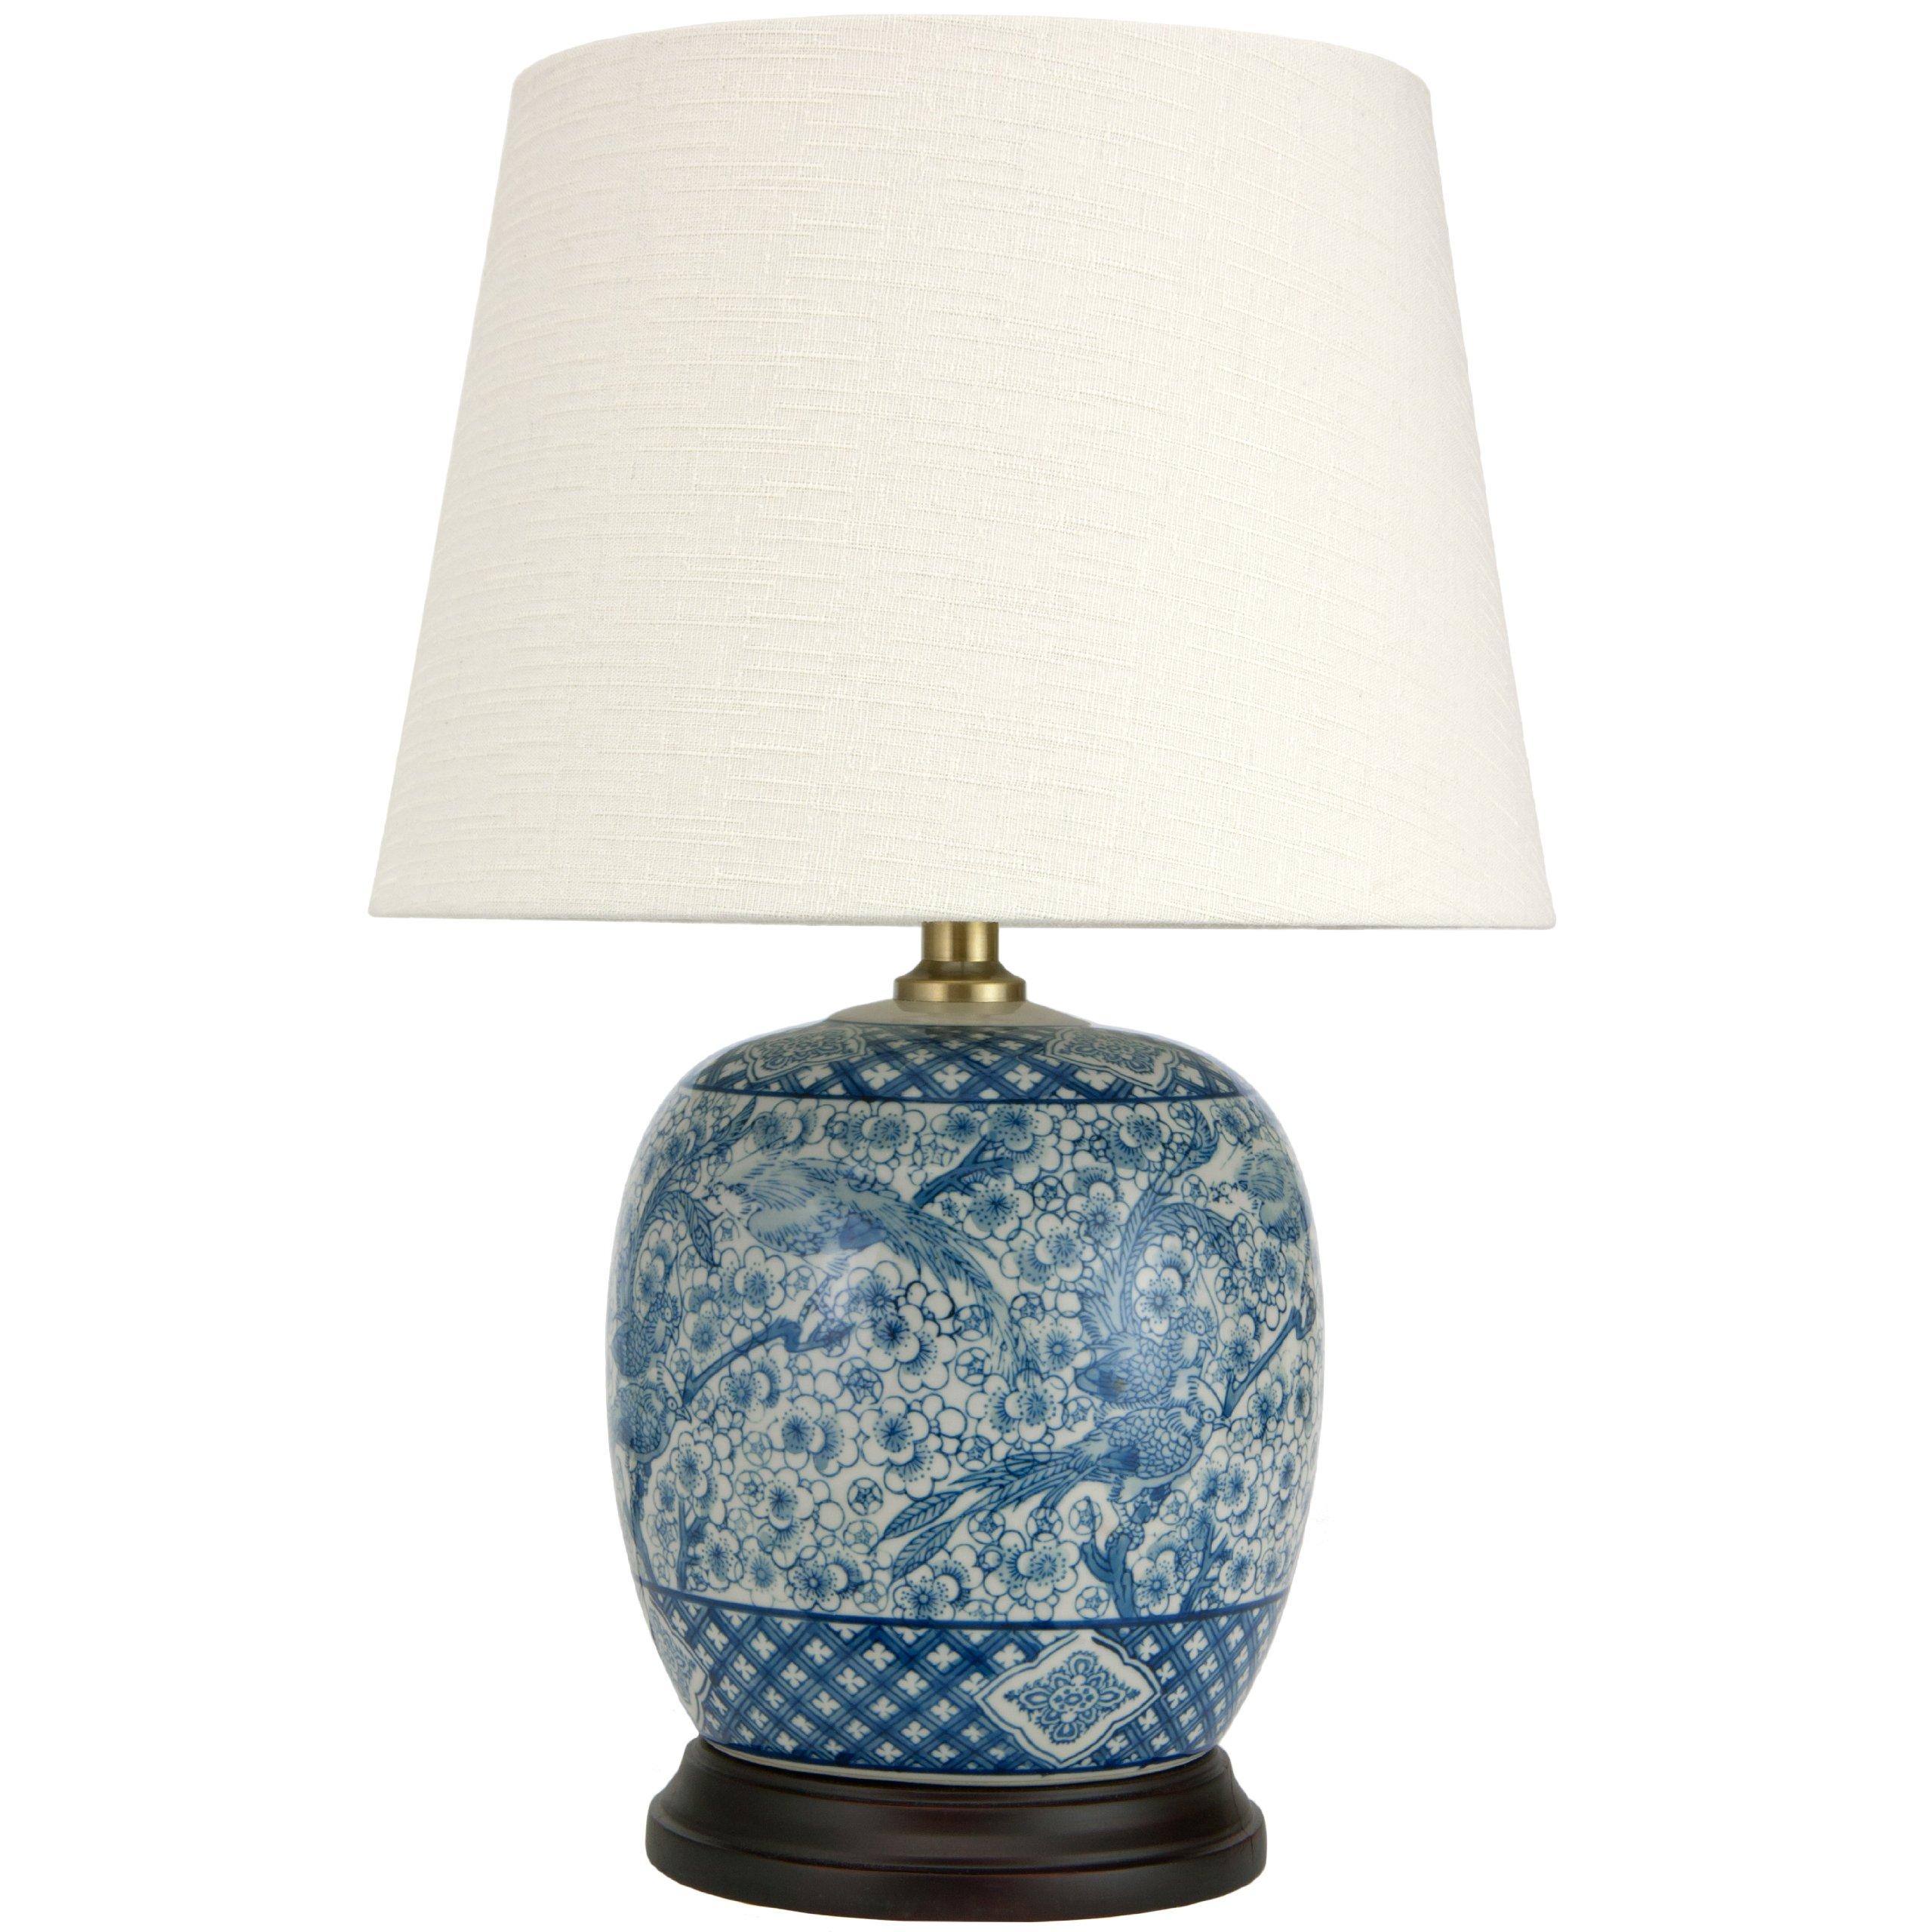 Oriental Furniture 20'' Classic Blue & White Porcelain Jar Lamp